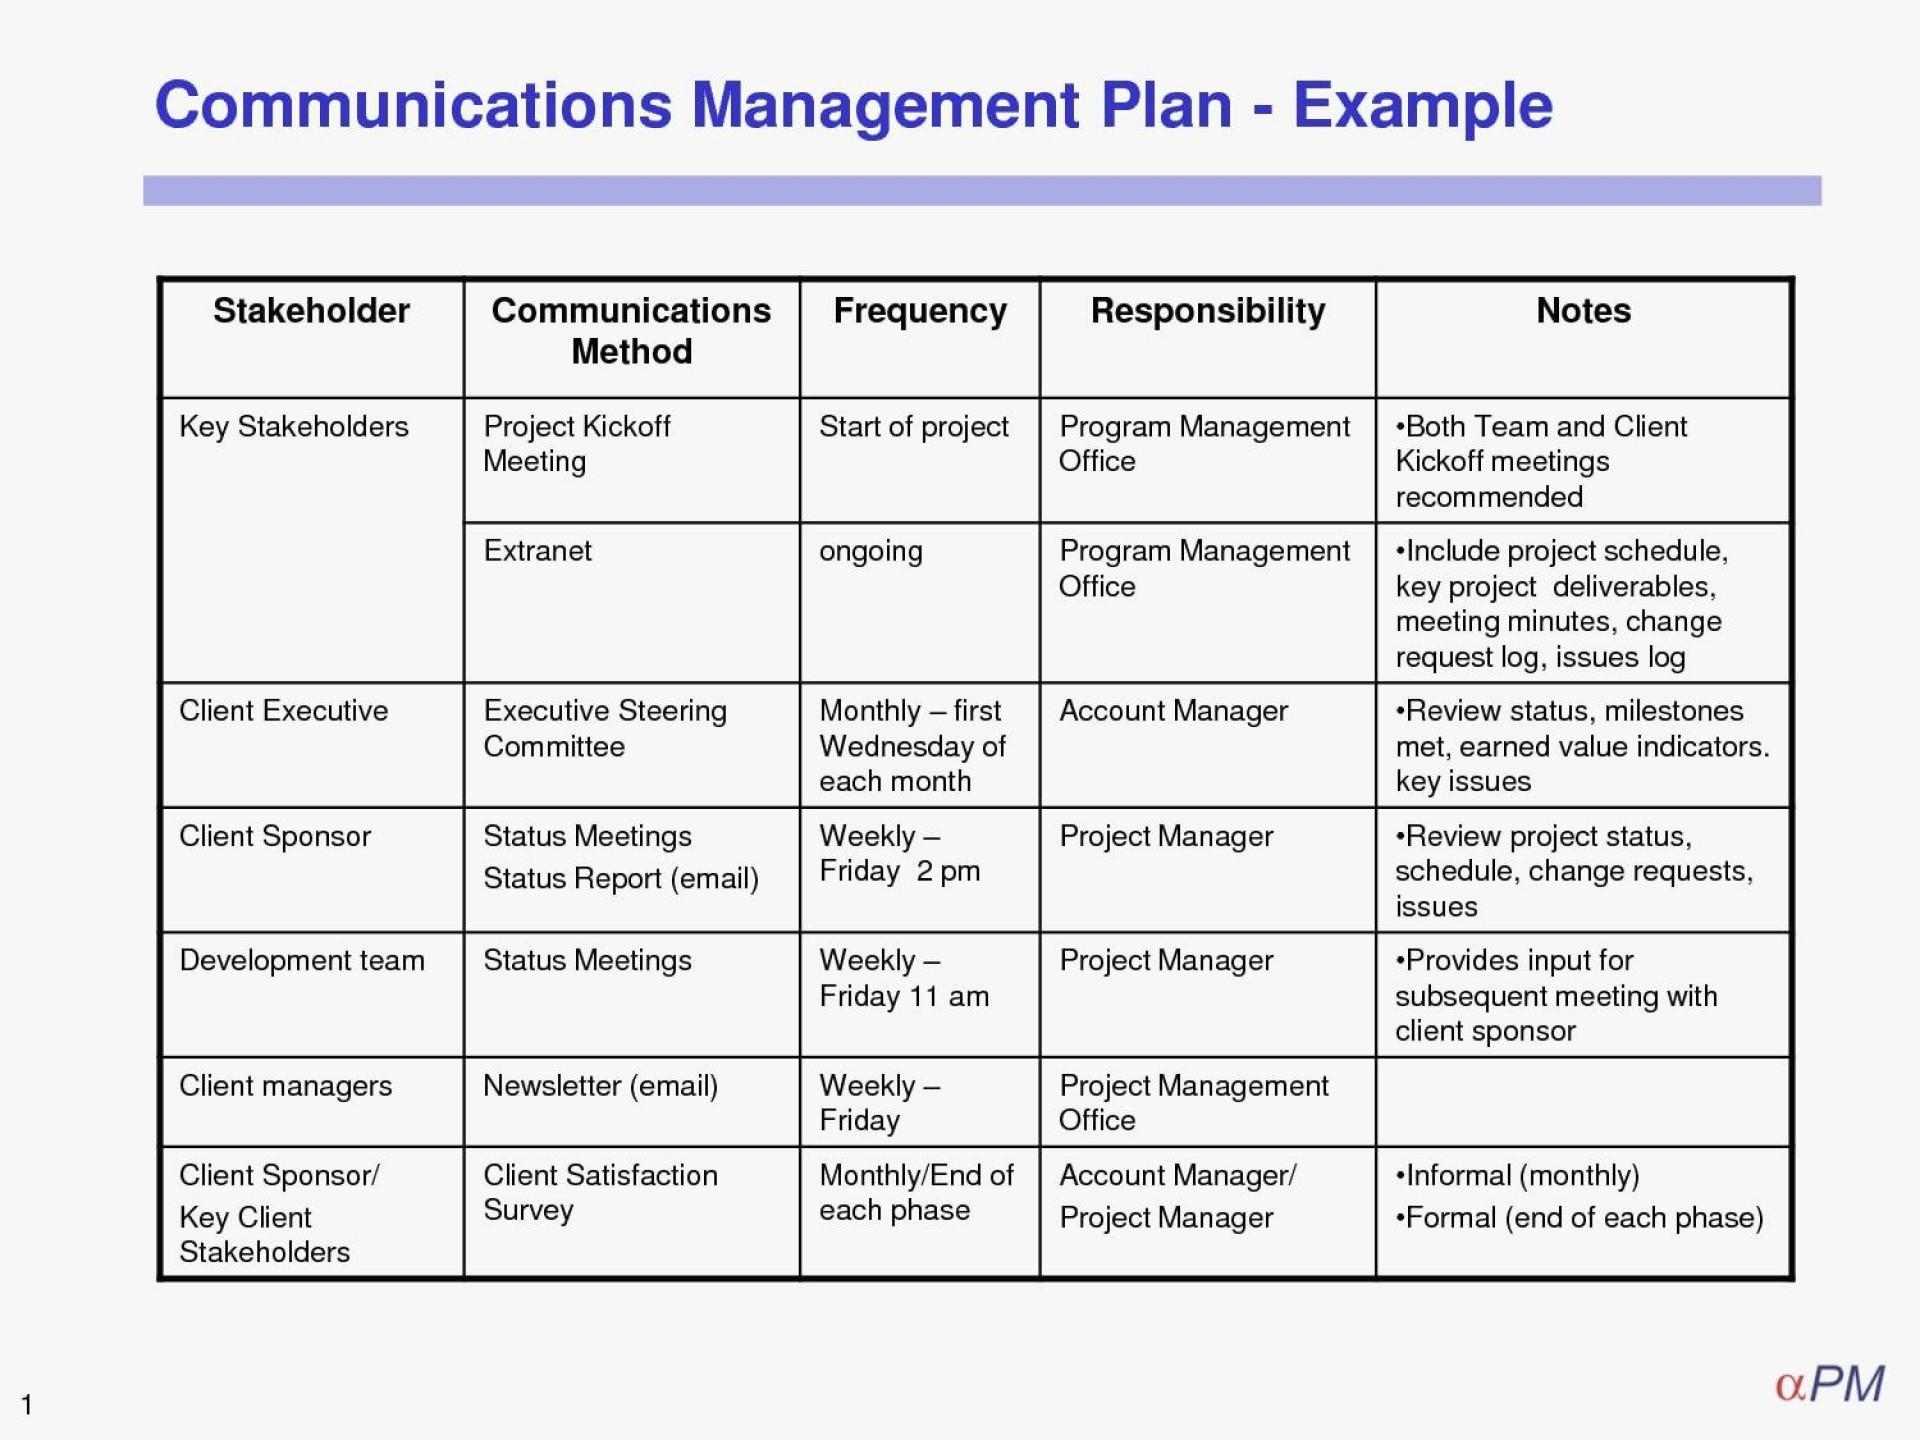 005 Top Crisi Management Plan Template Example  Uk Australia1920